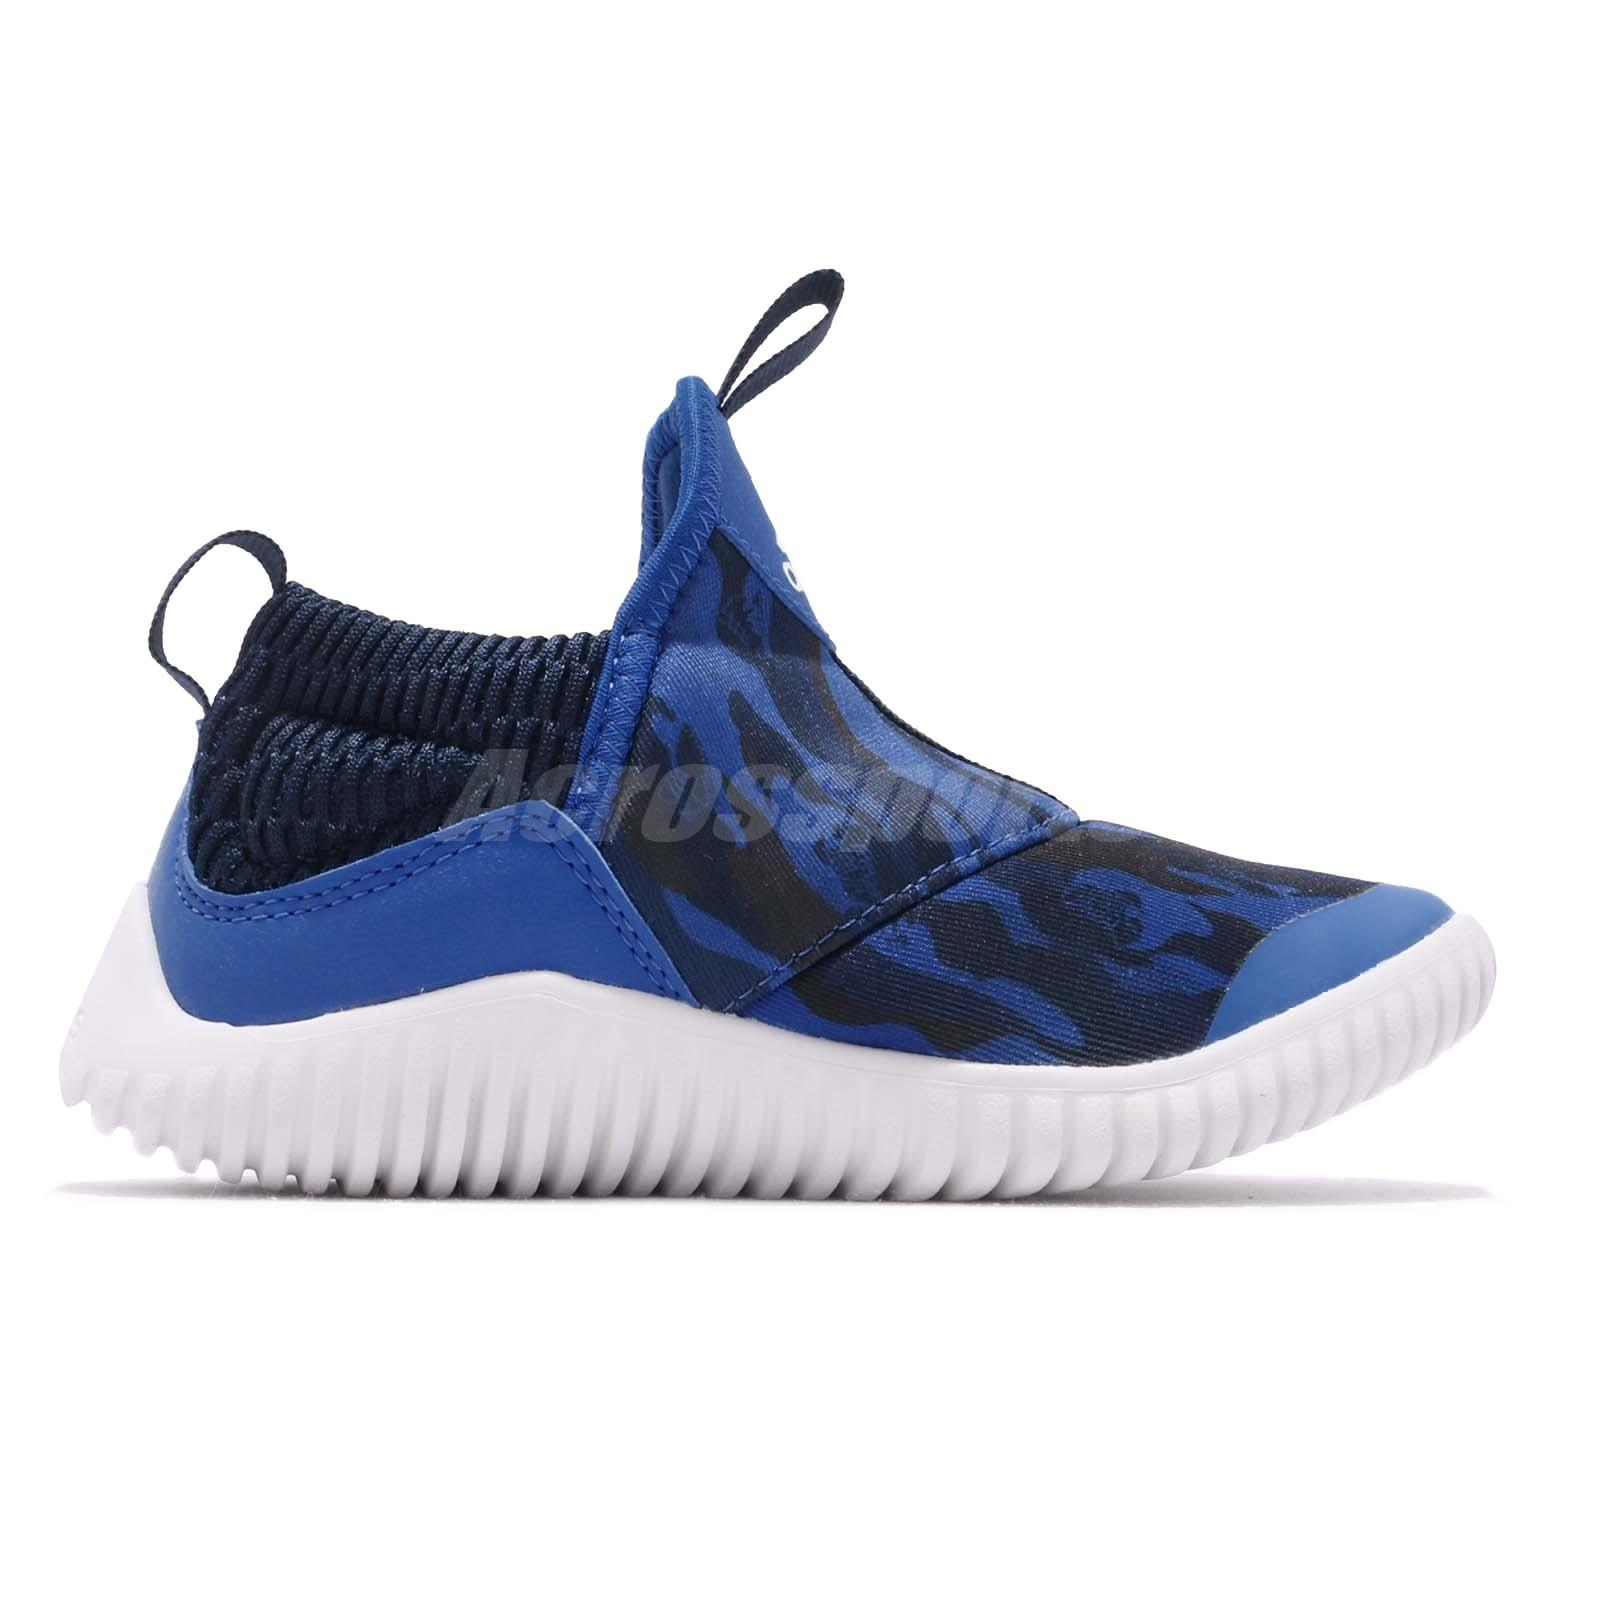 94c3693319b1 adidas RapidaZen C Blue Navy White Kid Preschool Slip On Shoes ...